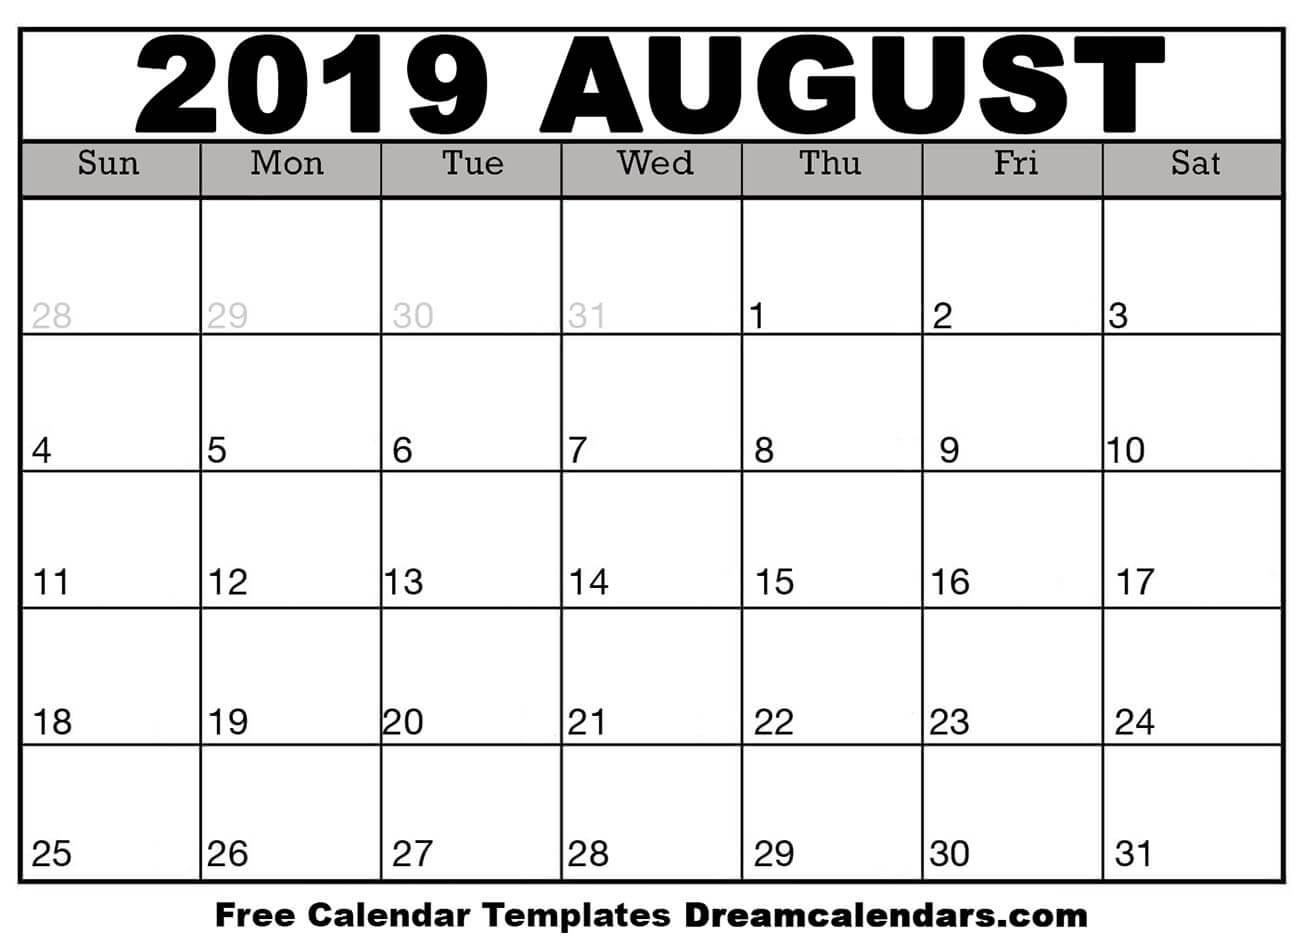 2019 calendar pdf